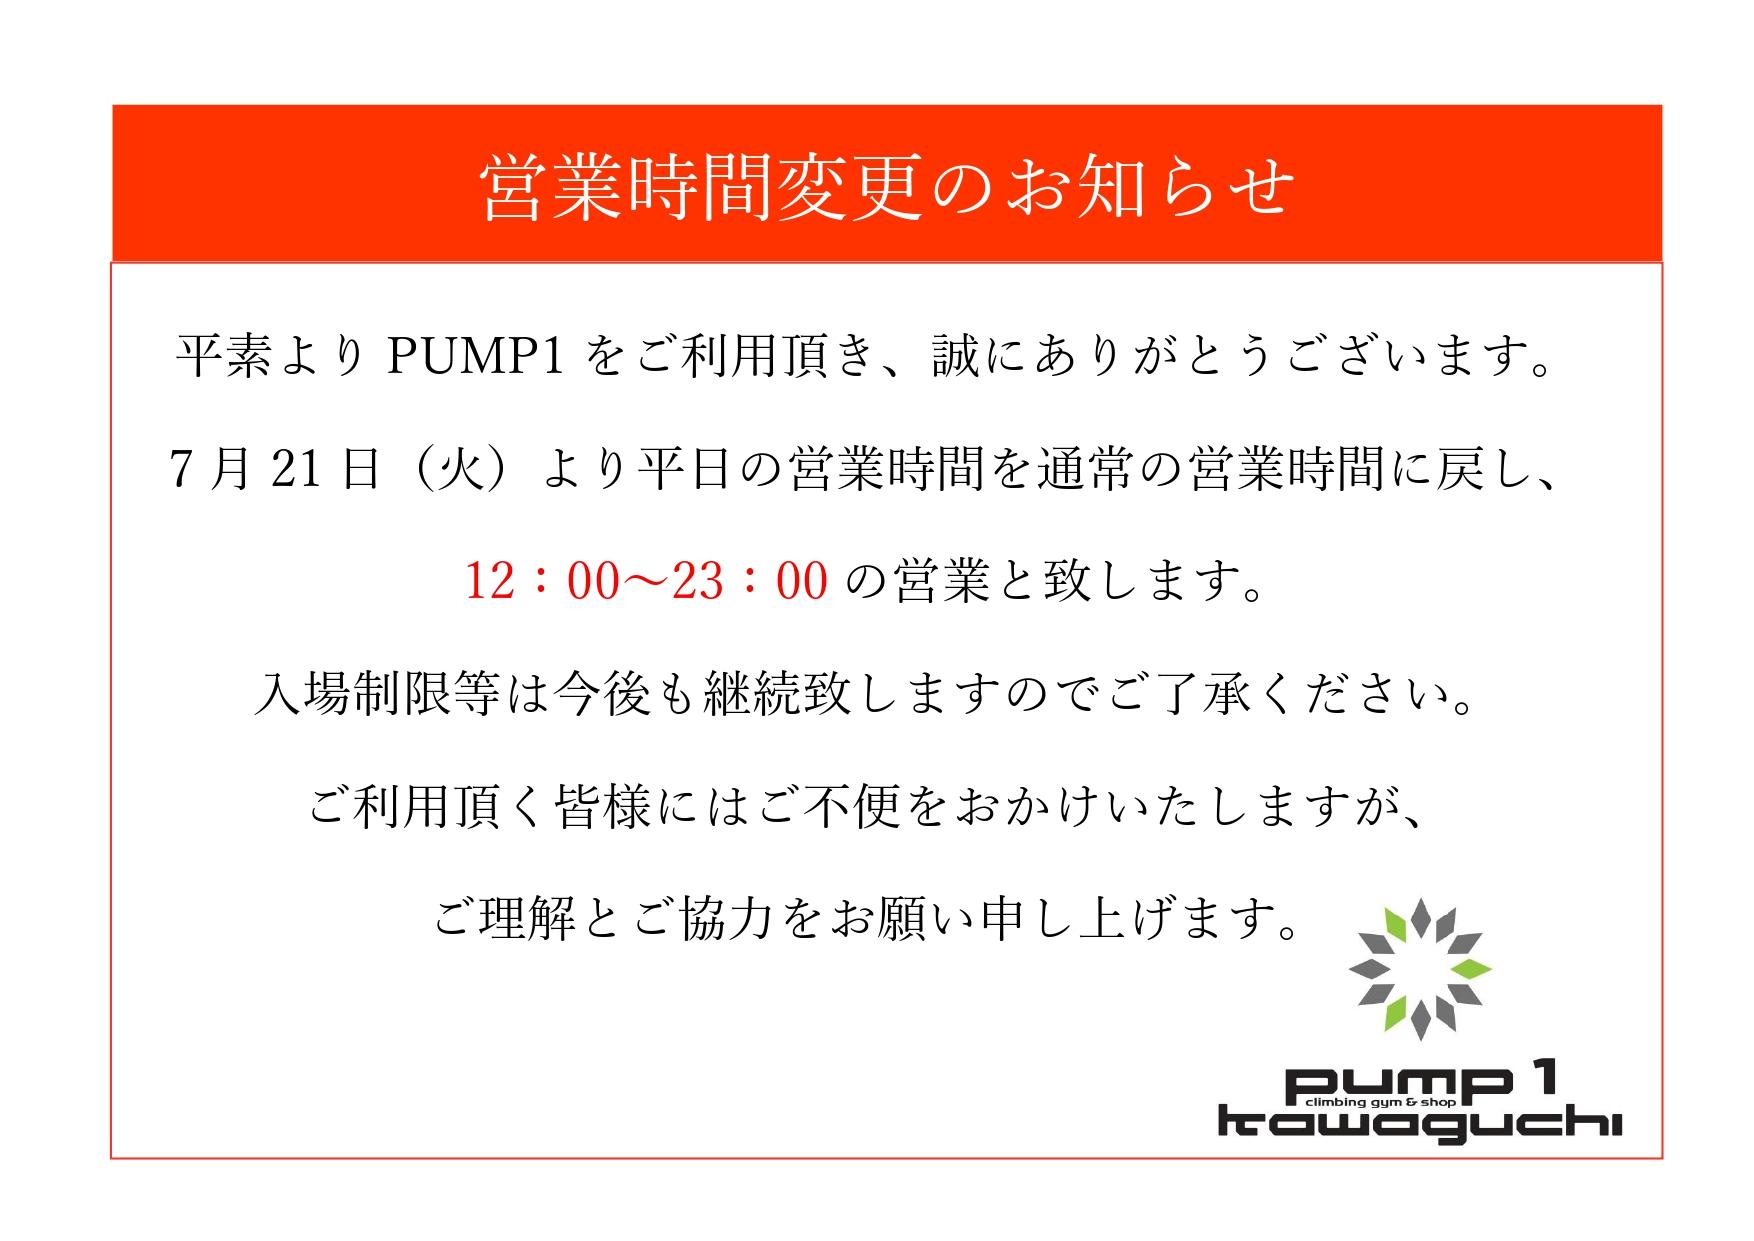 【PUMP川口店】平日営業時間変更のお知らせ